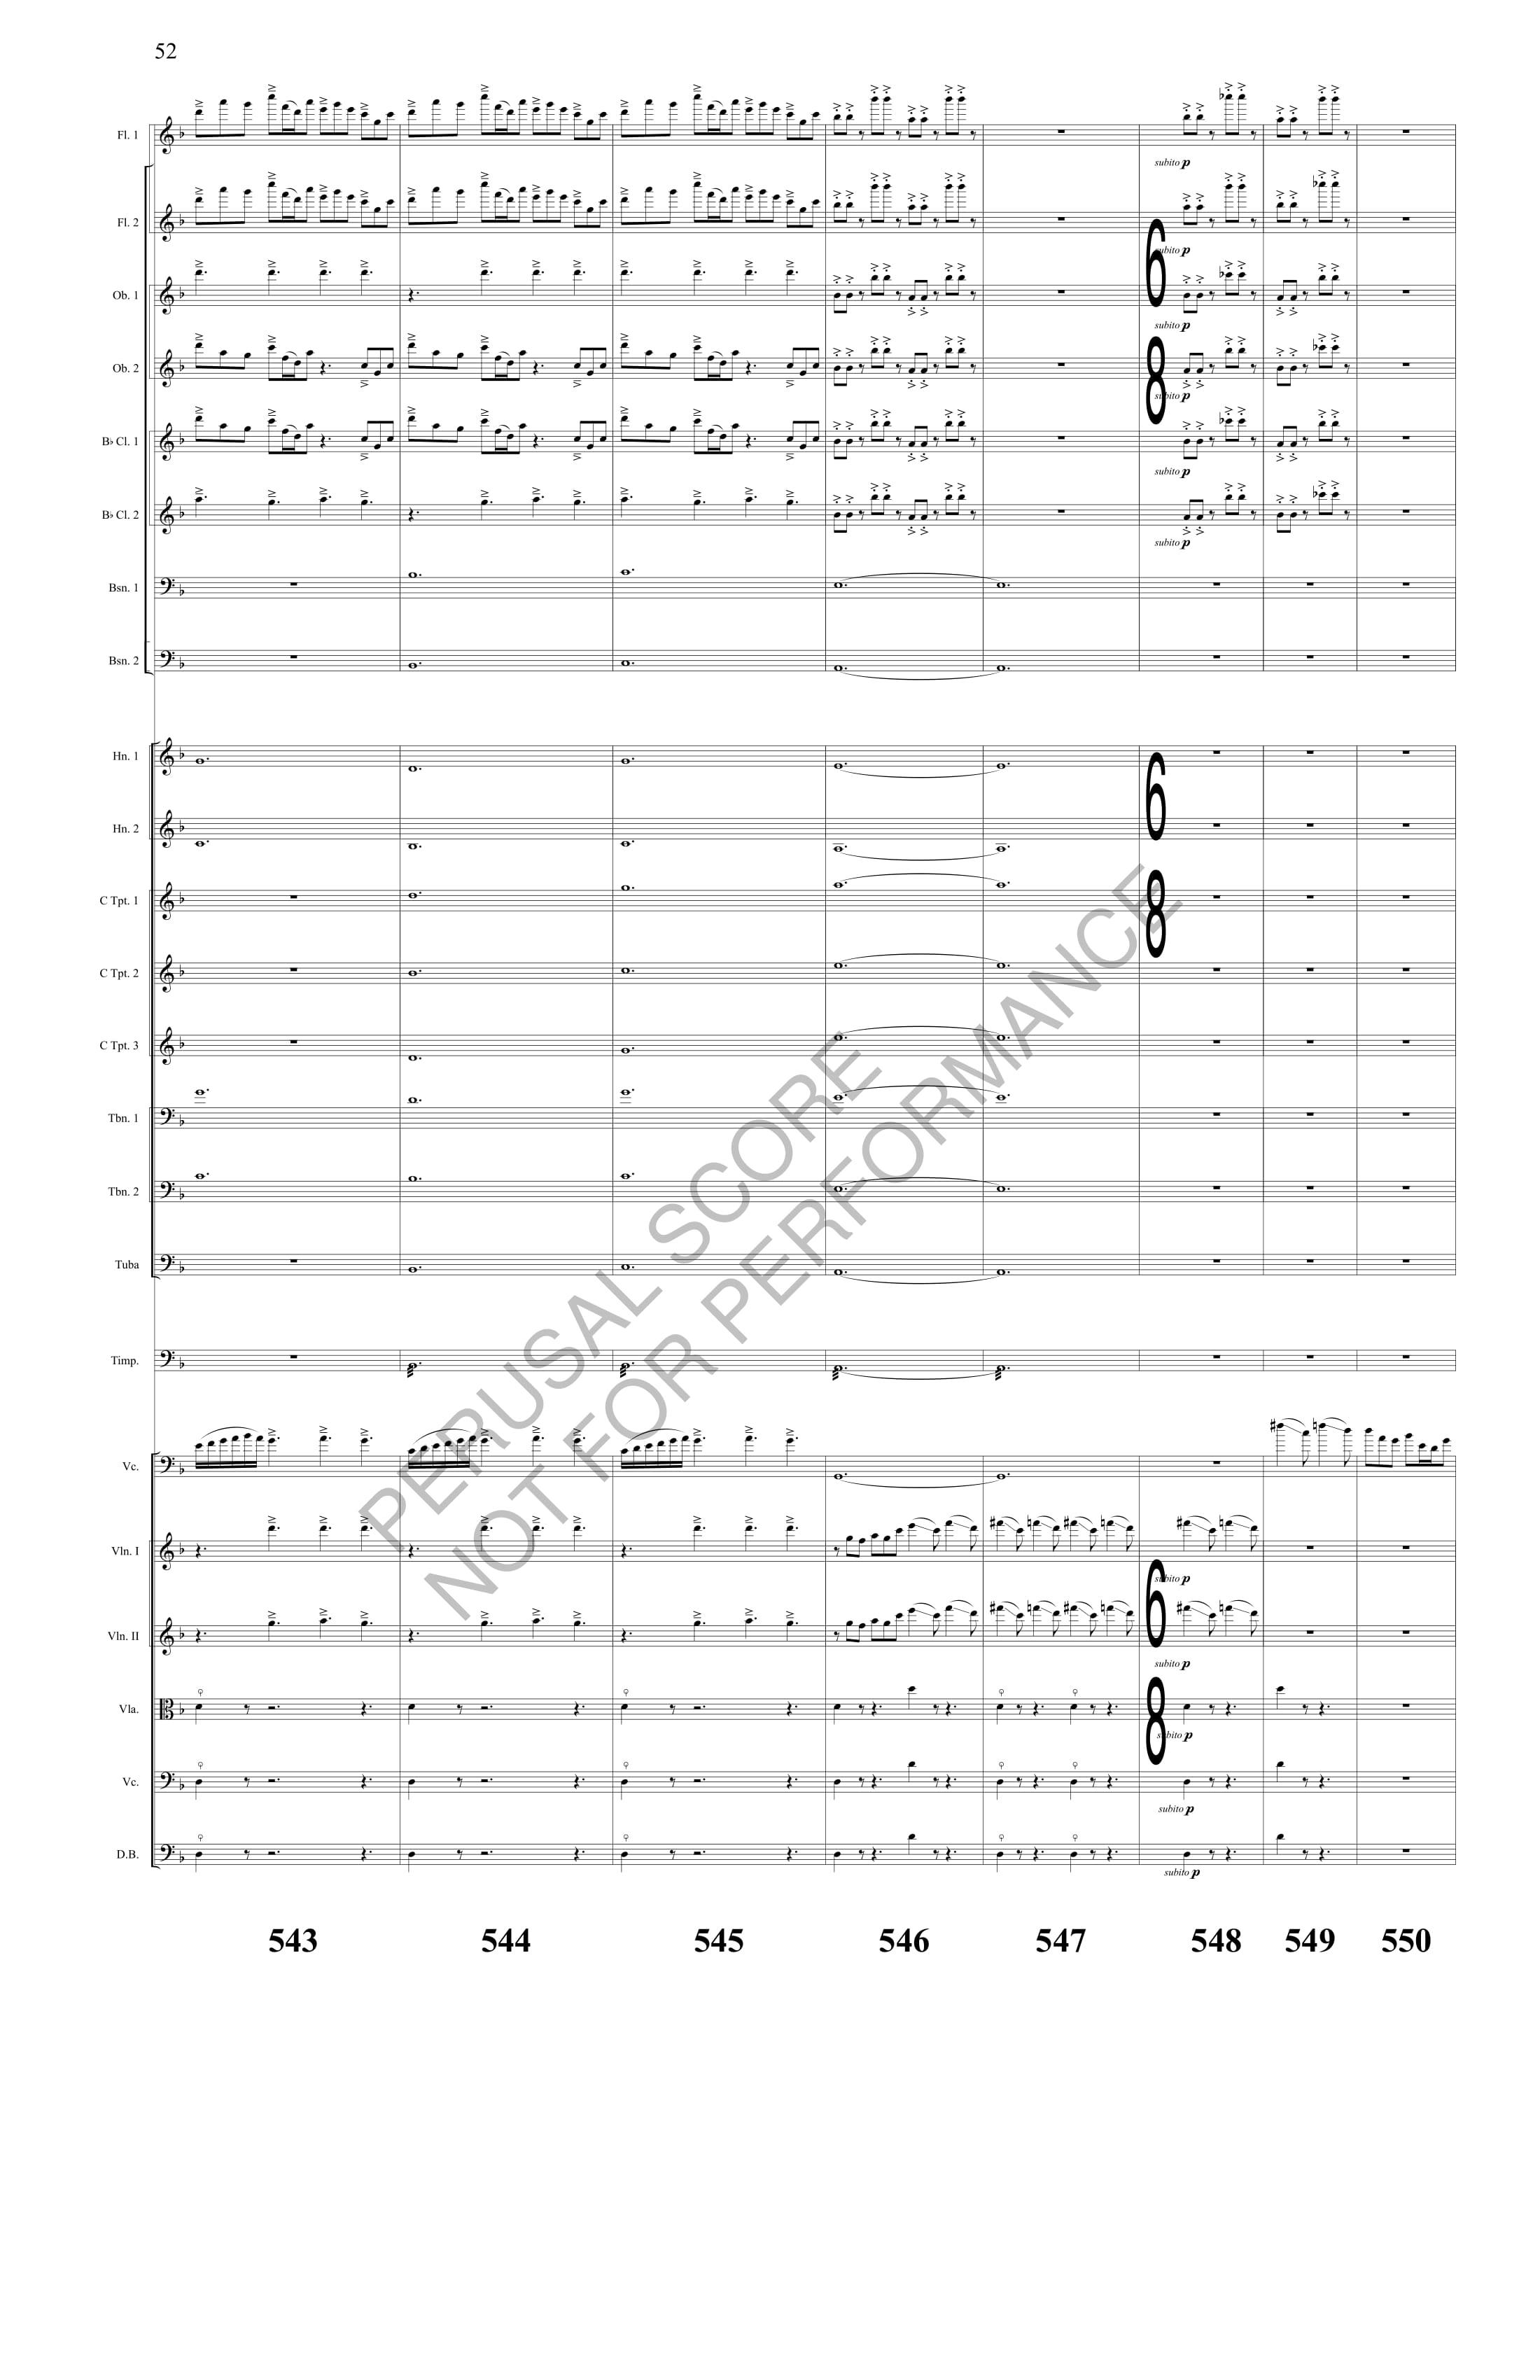 Boyd Tekton Score-watermark-58.jpg